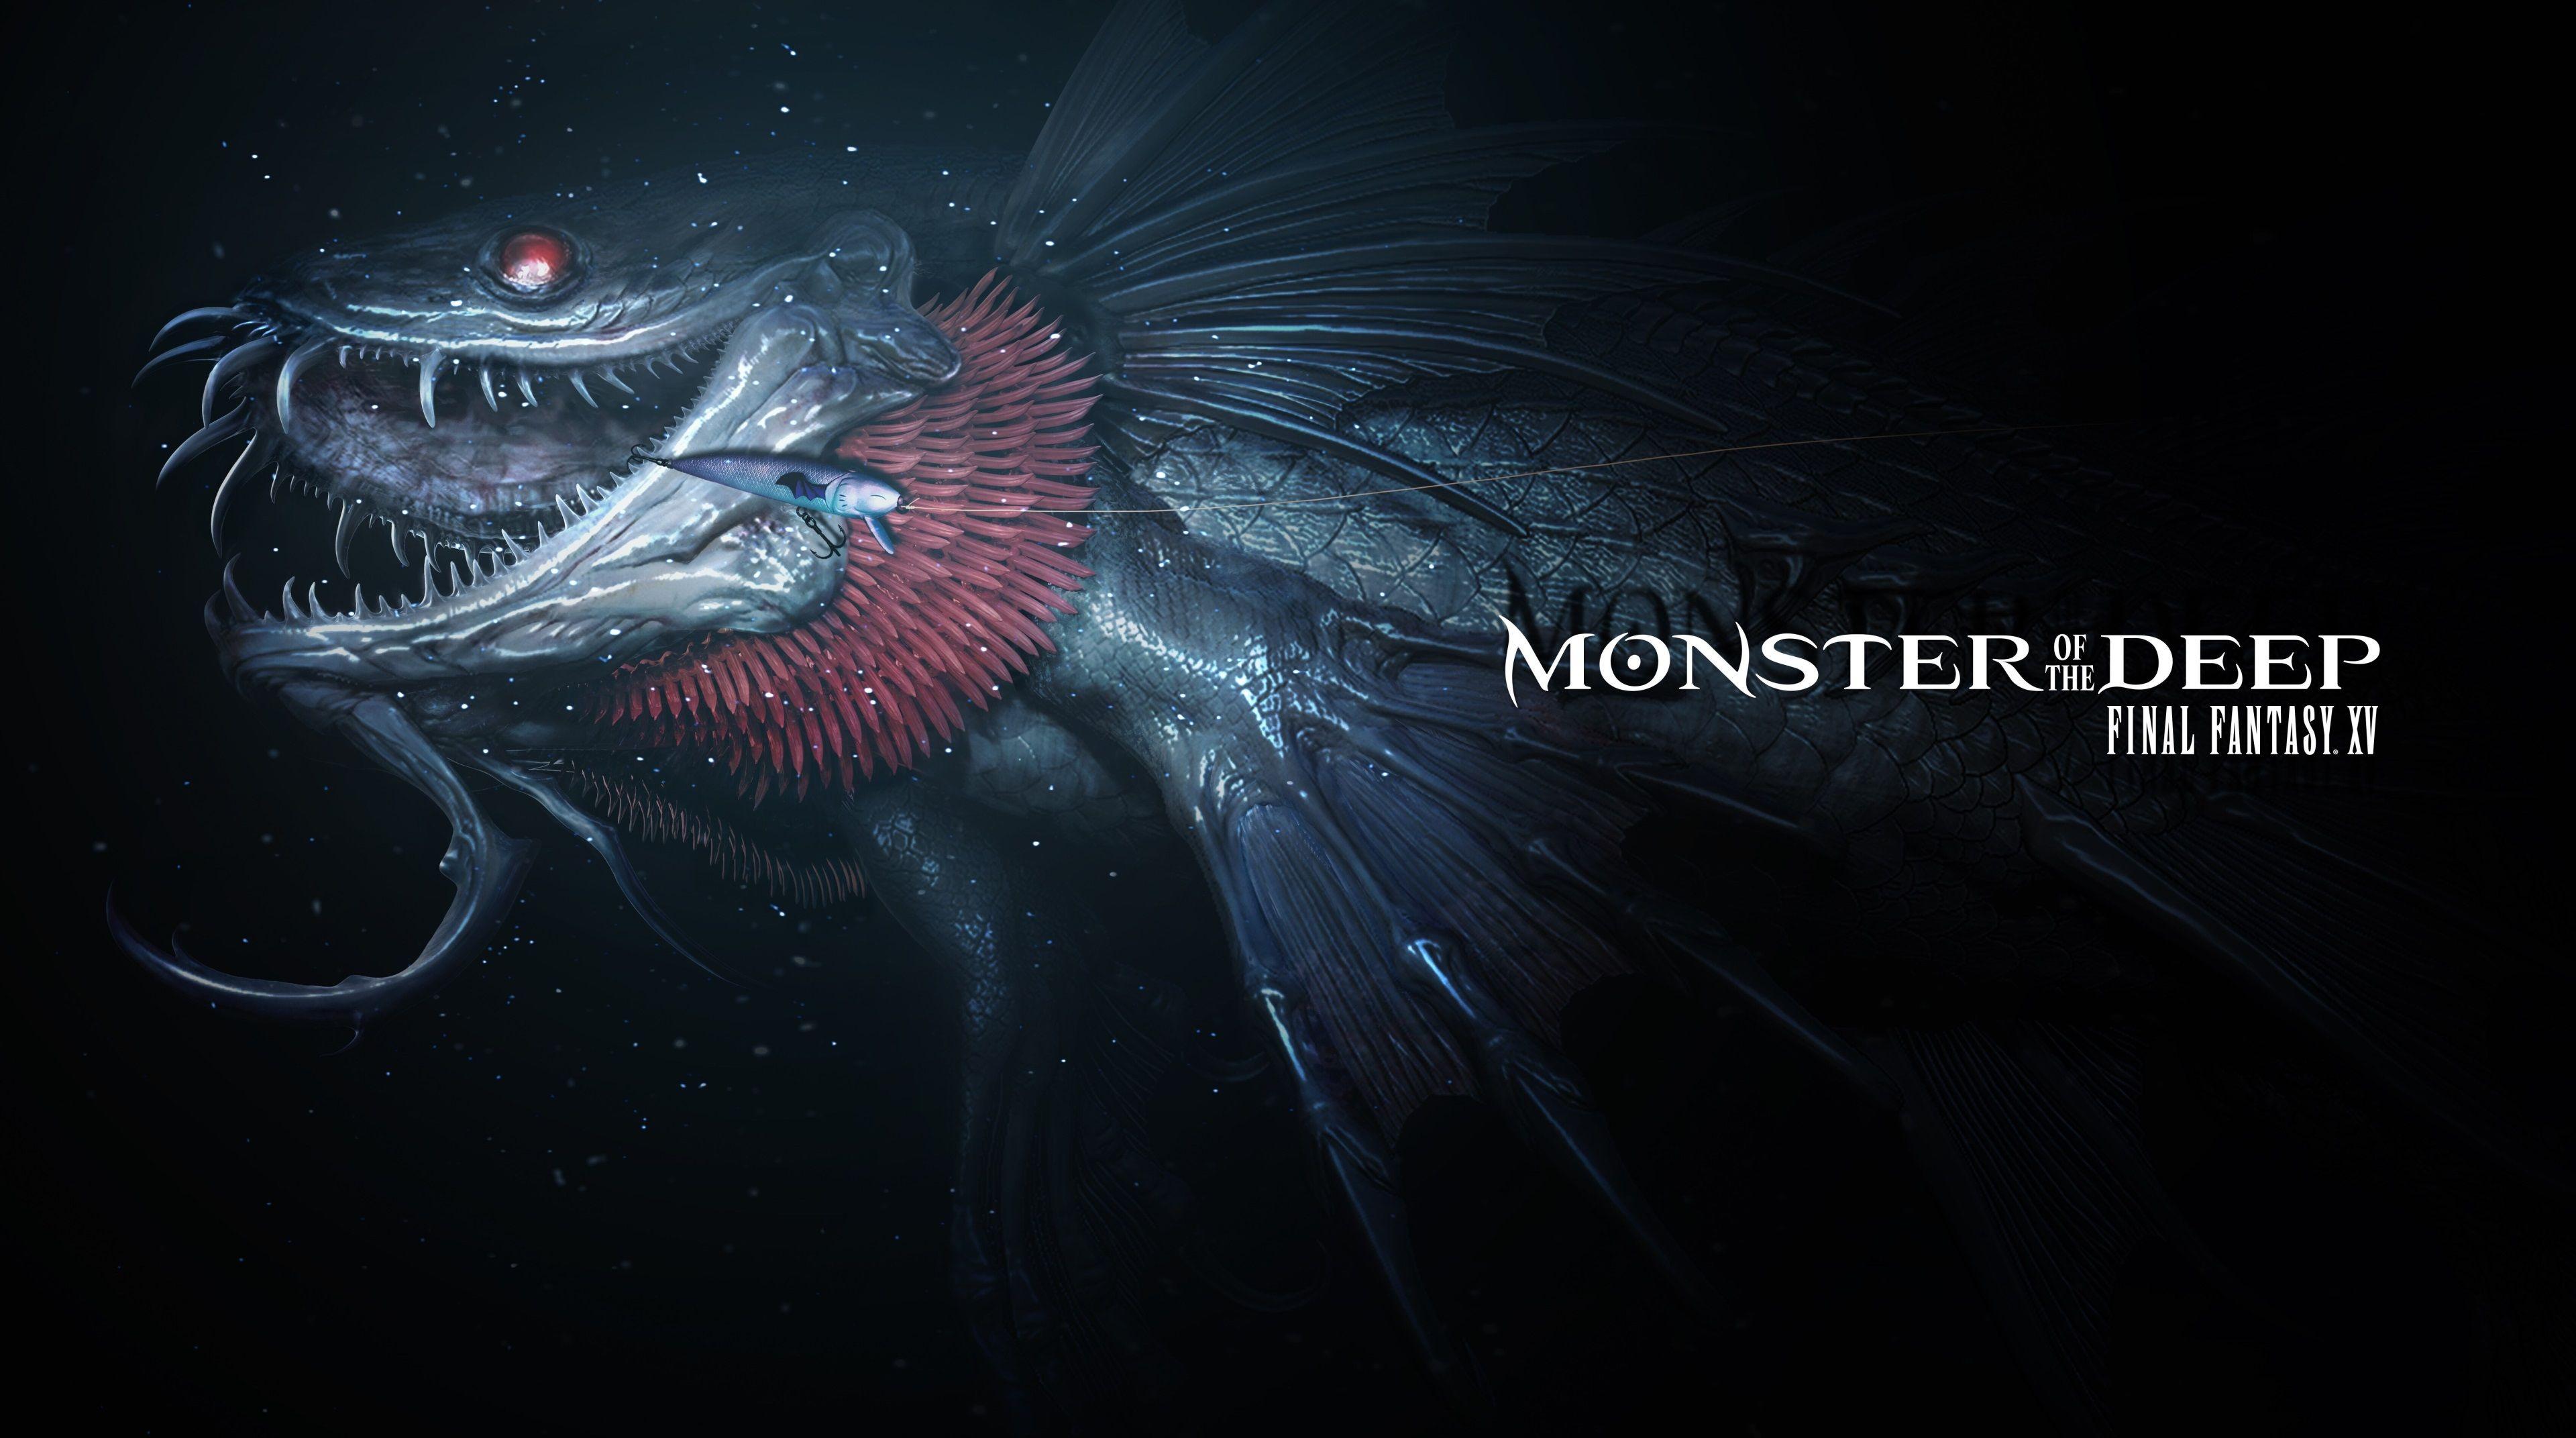 3840x2143 monster of the deep final fantasy xv 4k desktop